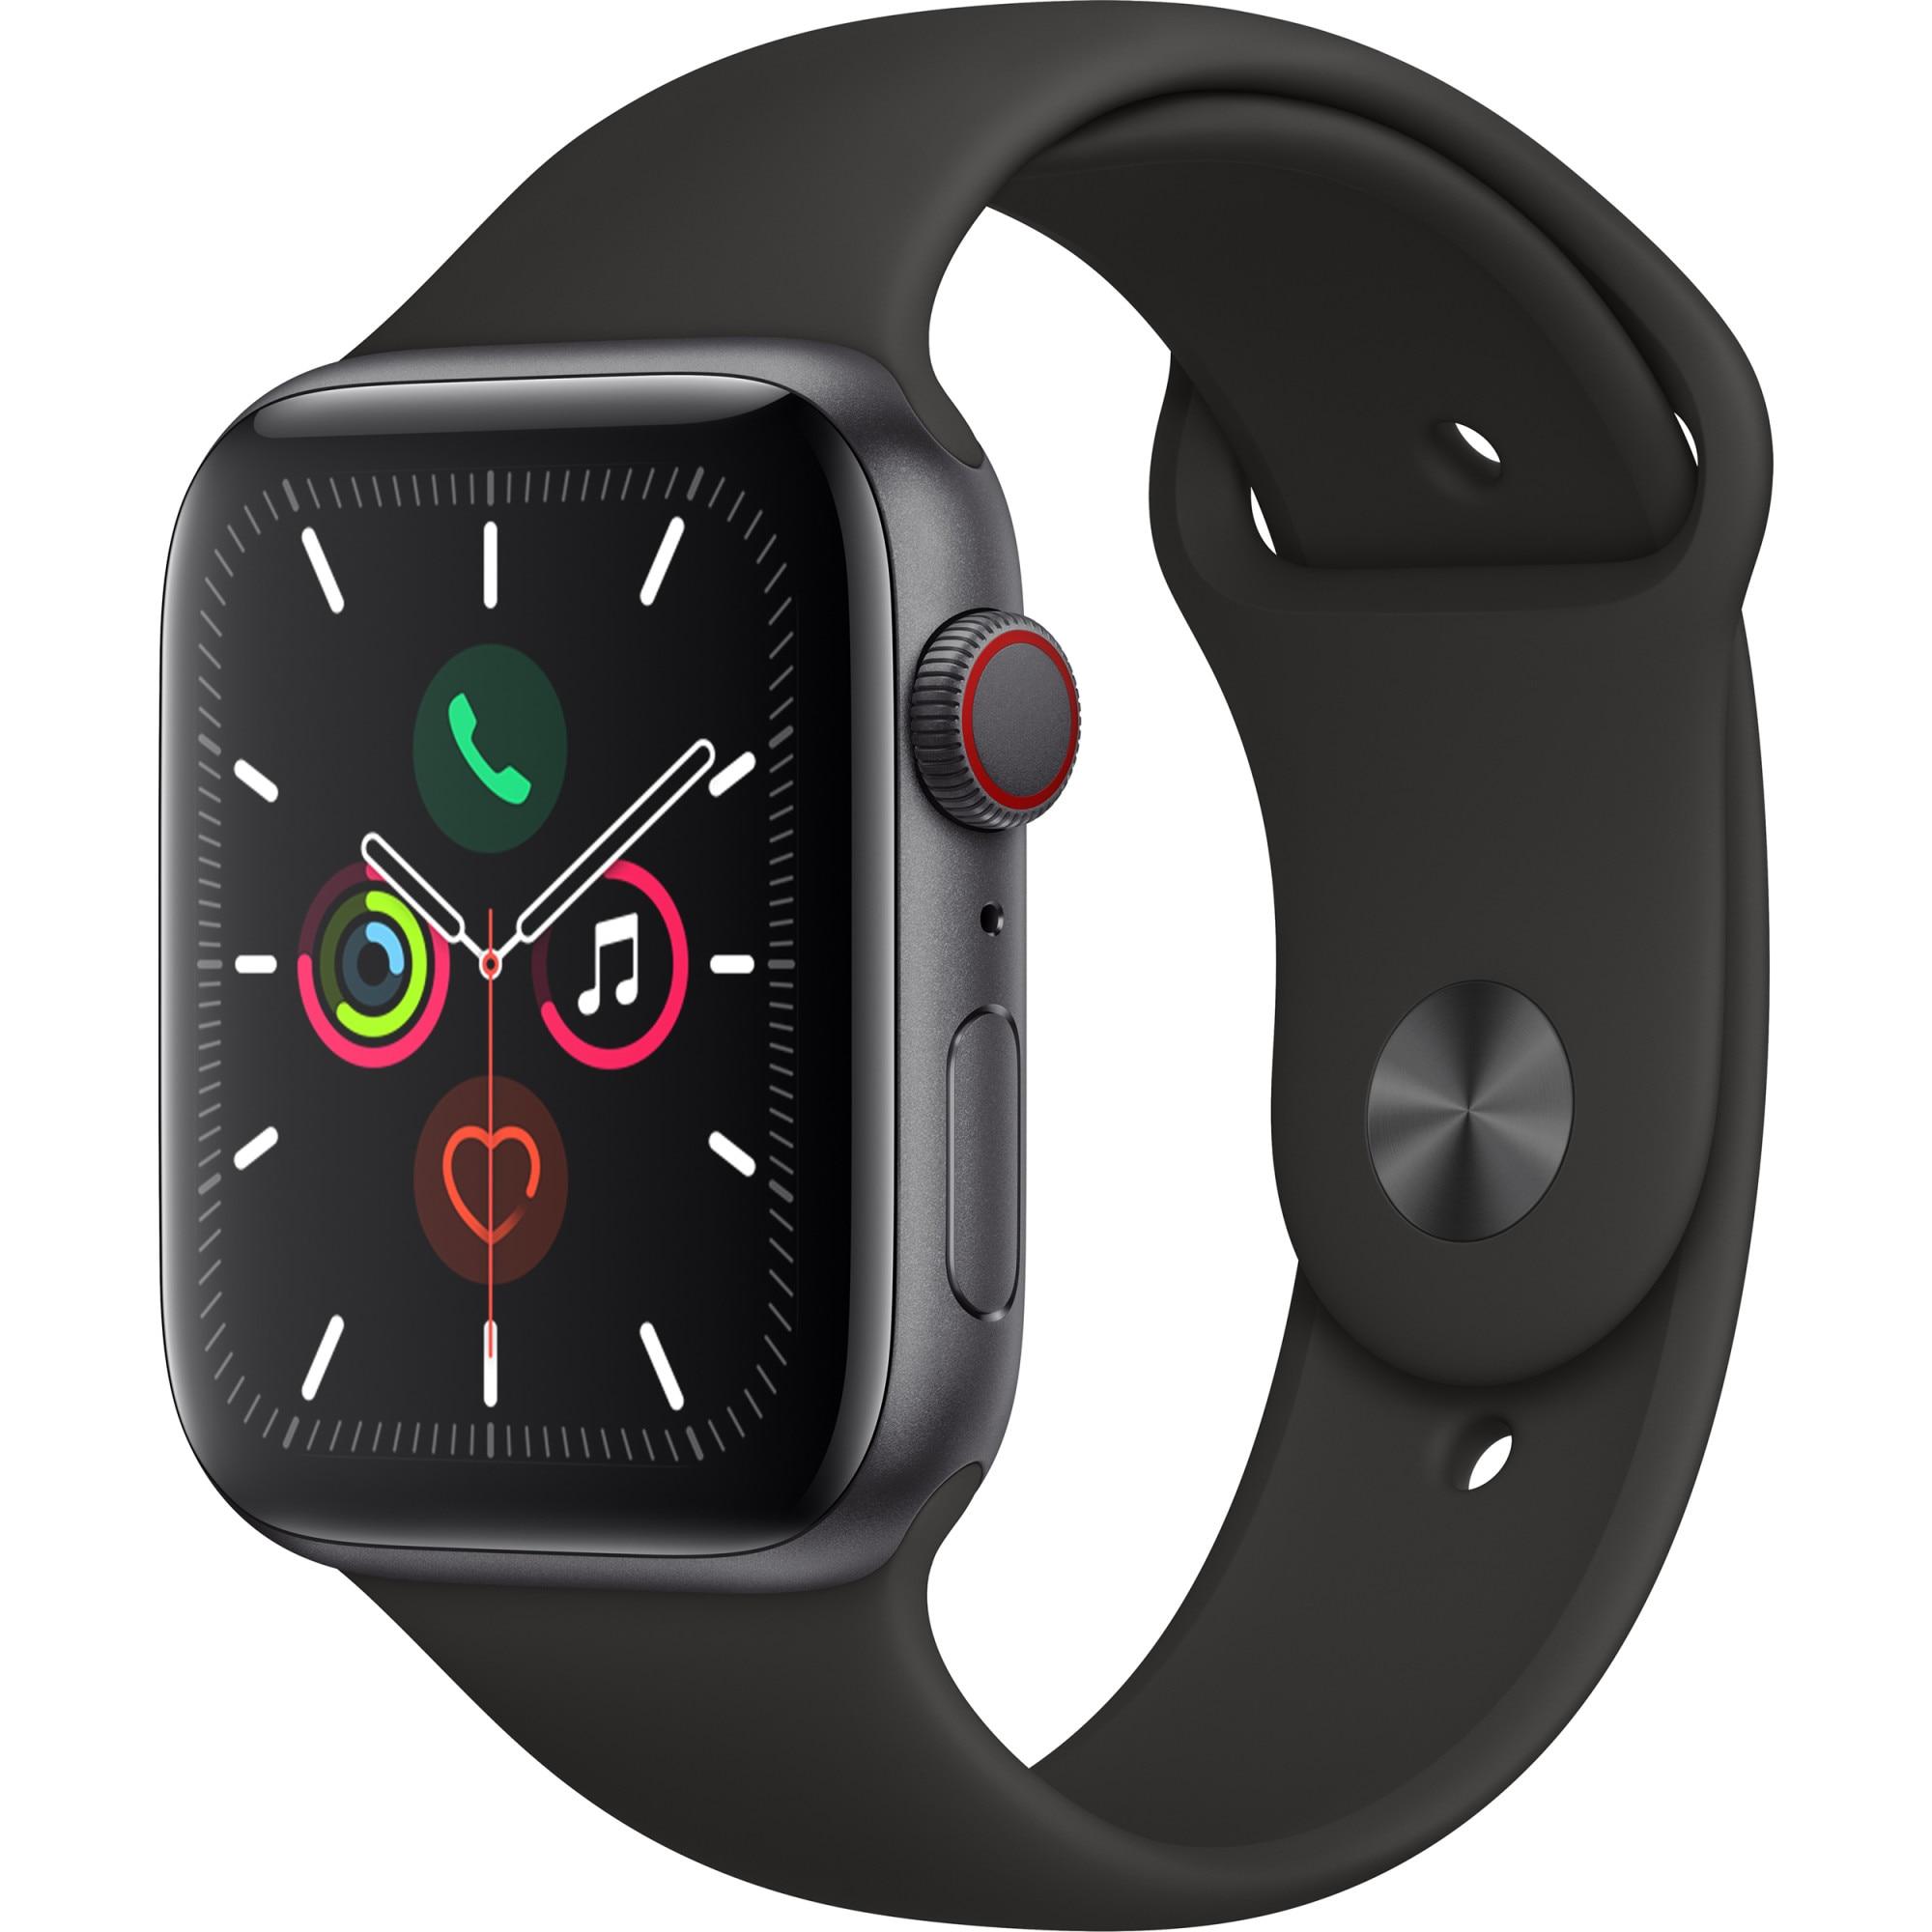 Fotografie Apple Watch 5, GPS, Cellular, Carcasa Space Grey Aluminium 44mm, Black Sport Band - S/M & M/L